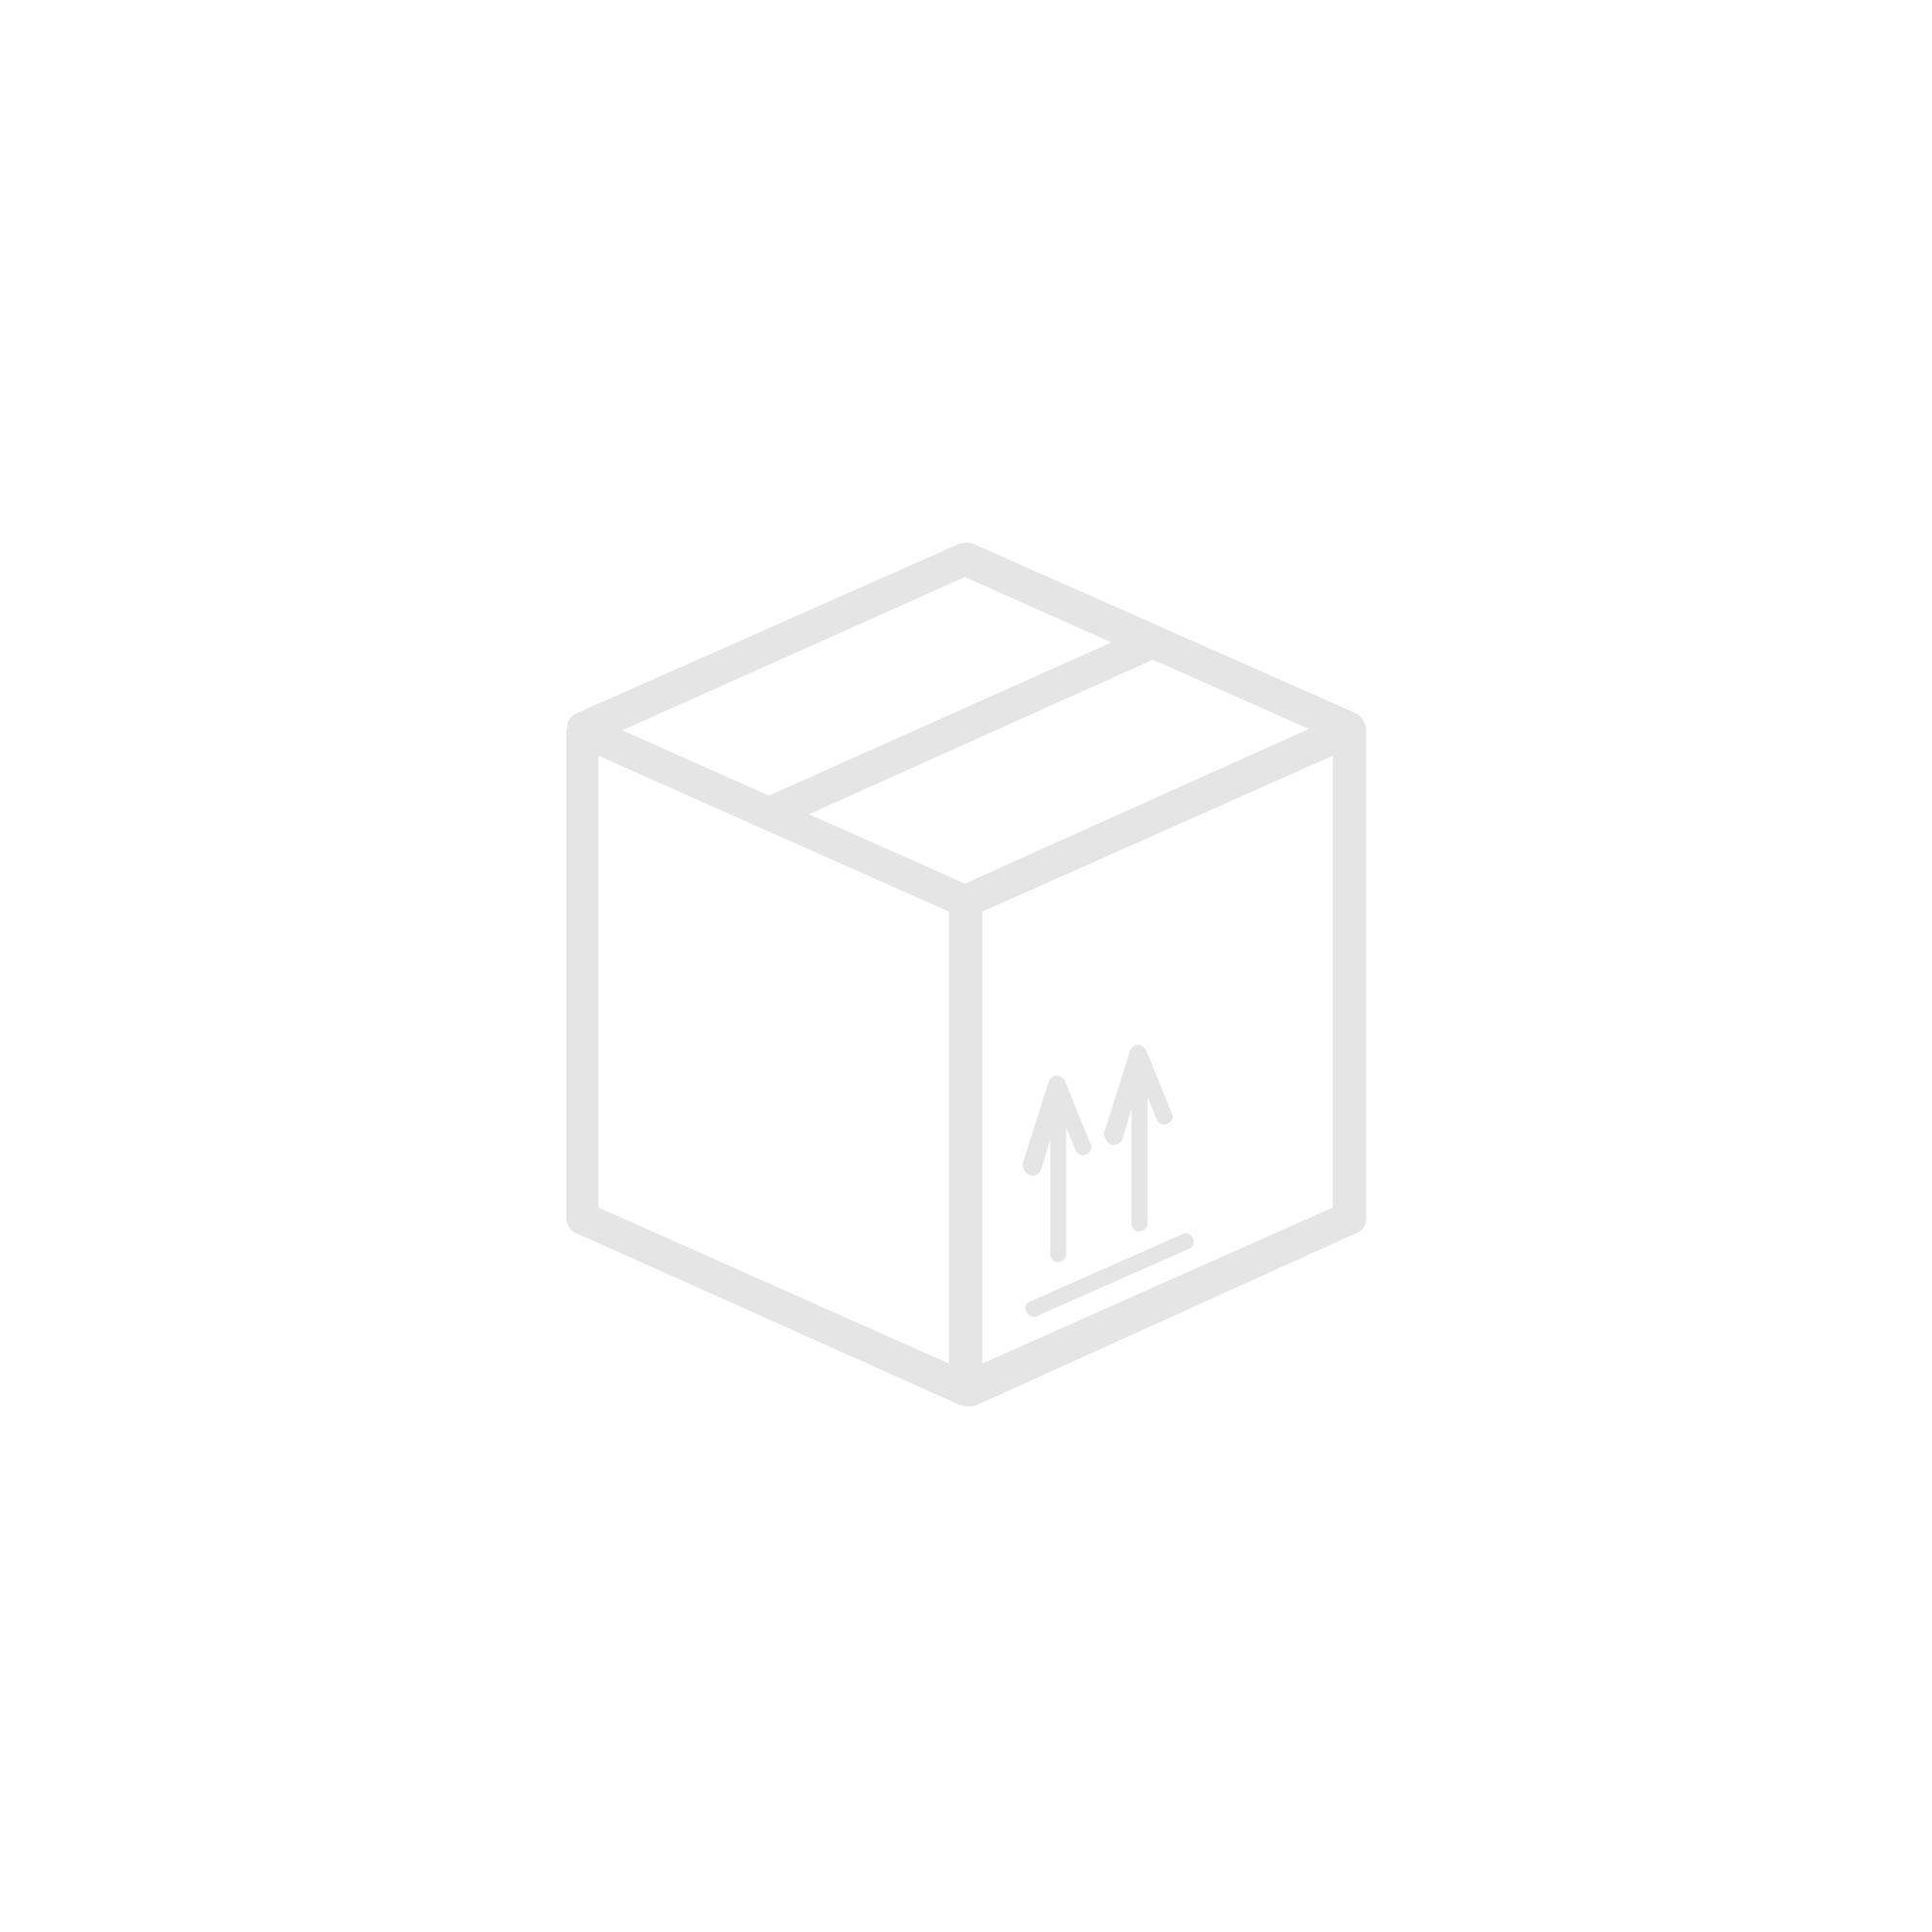 MCLED Žárovka LED 5,5W-40 E14 4000K 200° McLED